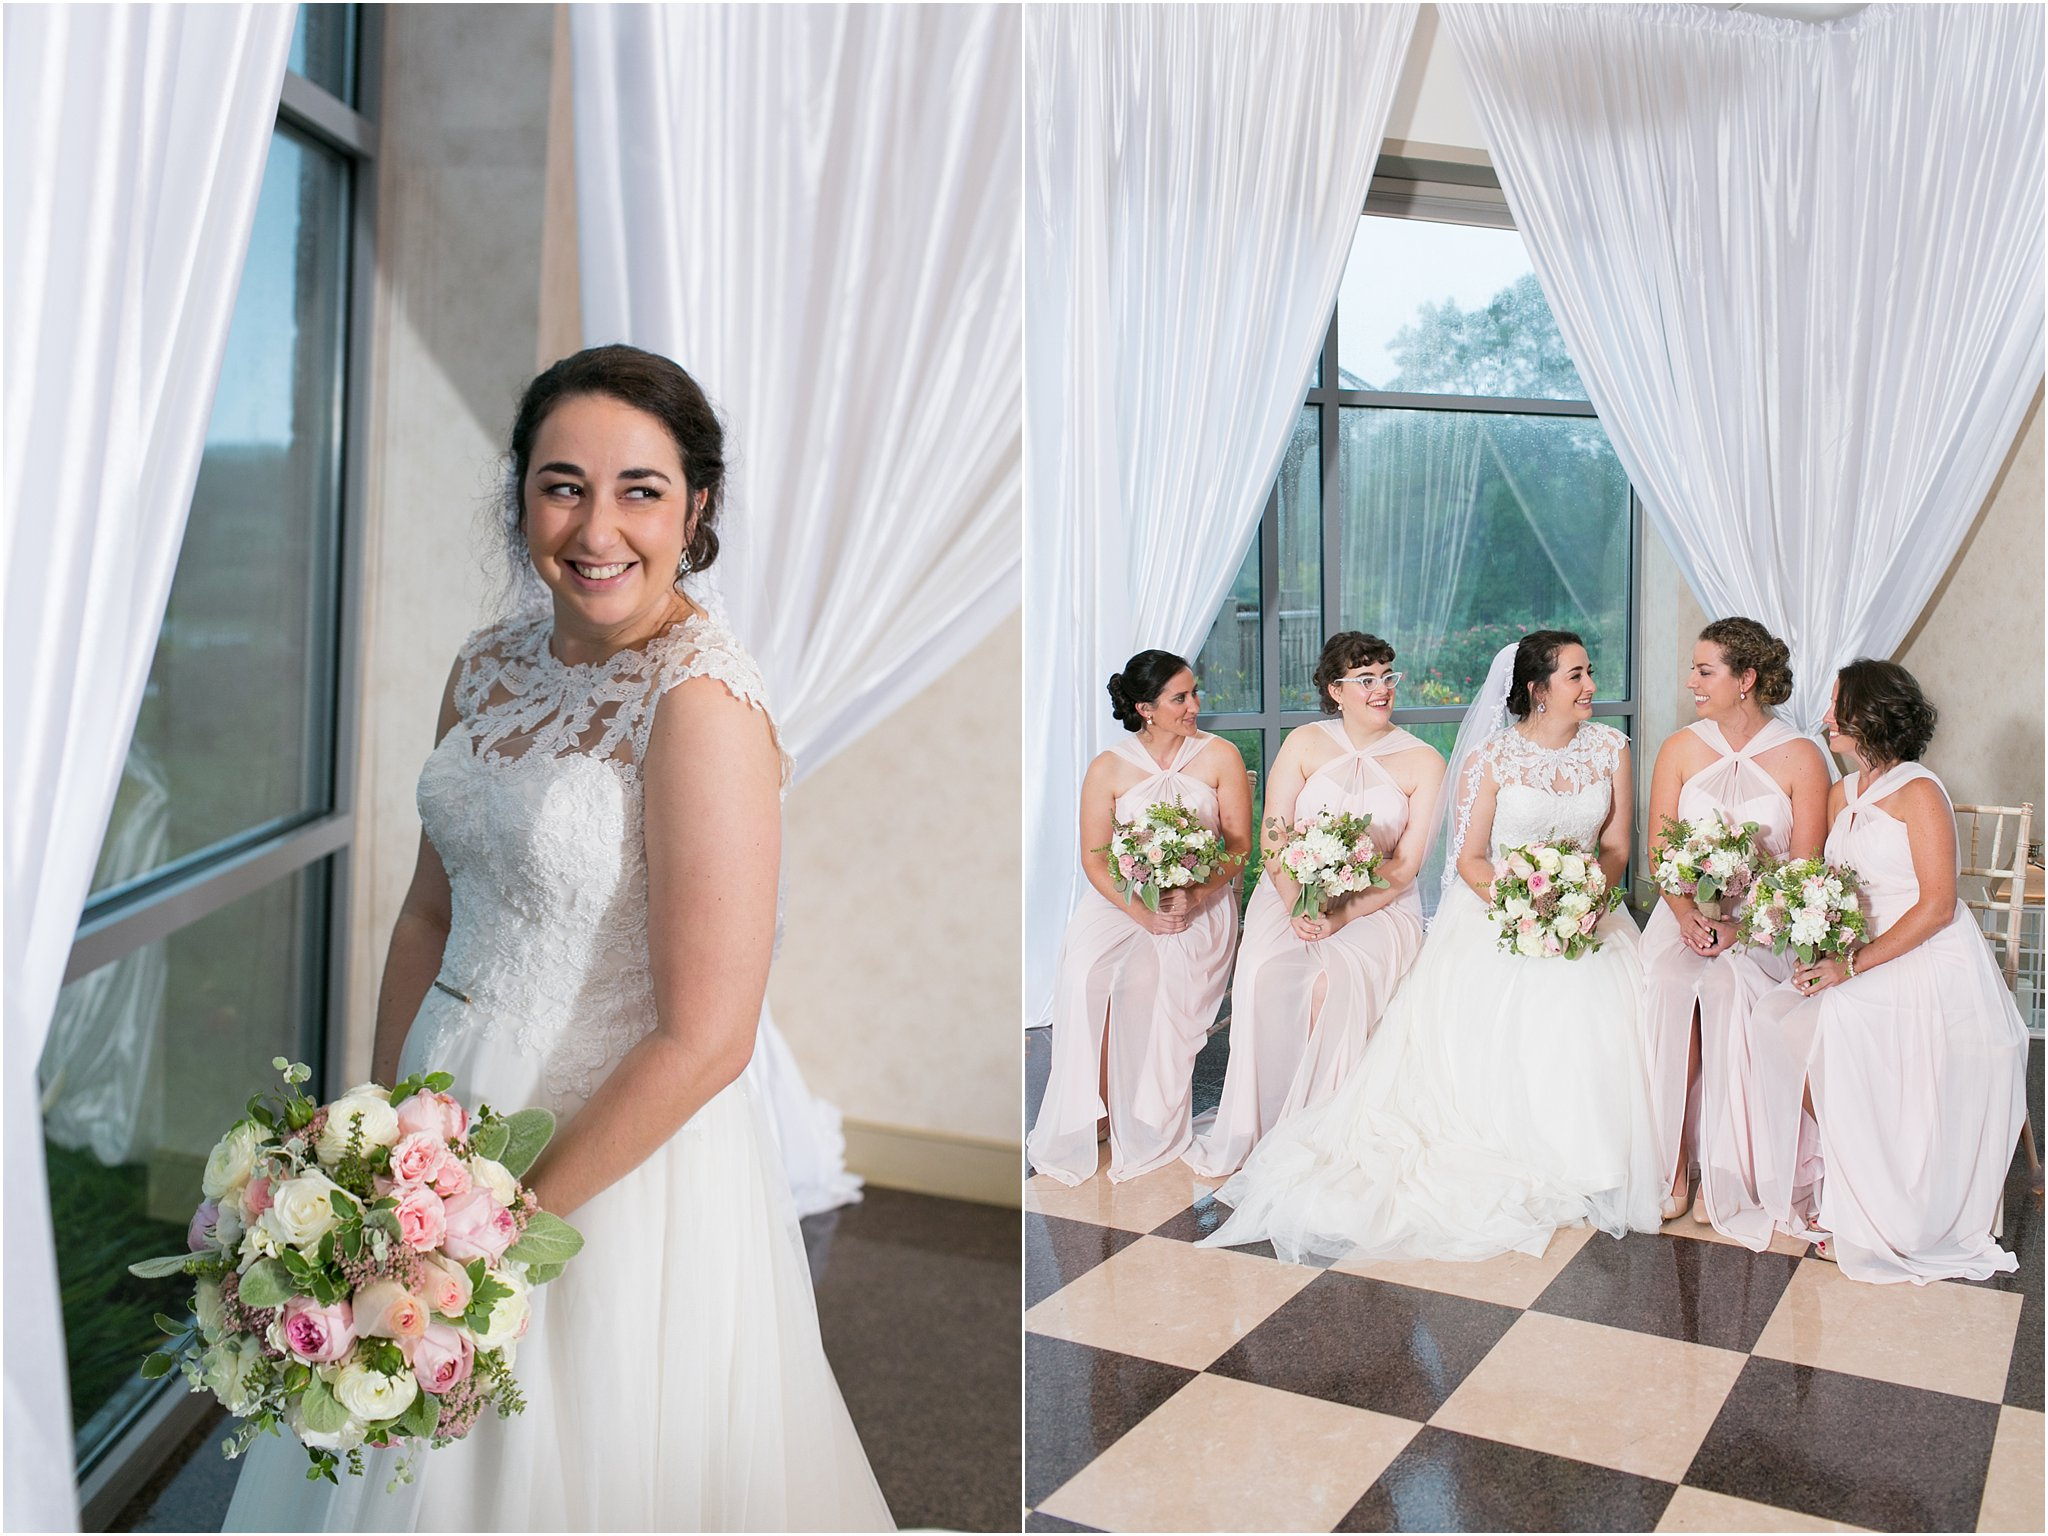 jessica_ryan_photography_virginia_wedding_photographer_wedding_hurricane_norfolk_botanical_gardens_hurricane_matthew_wedding_3586